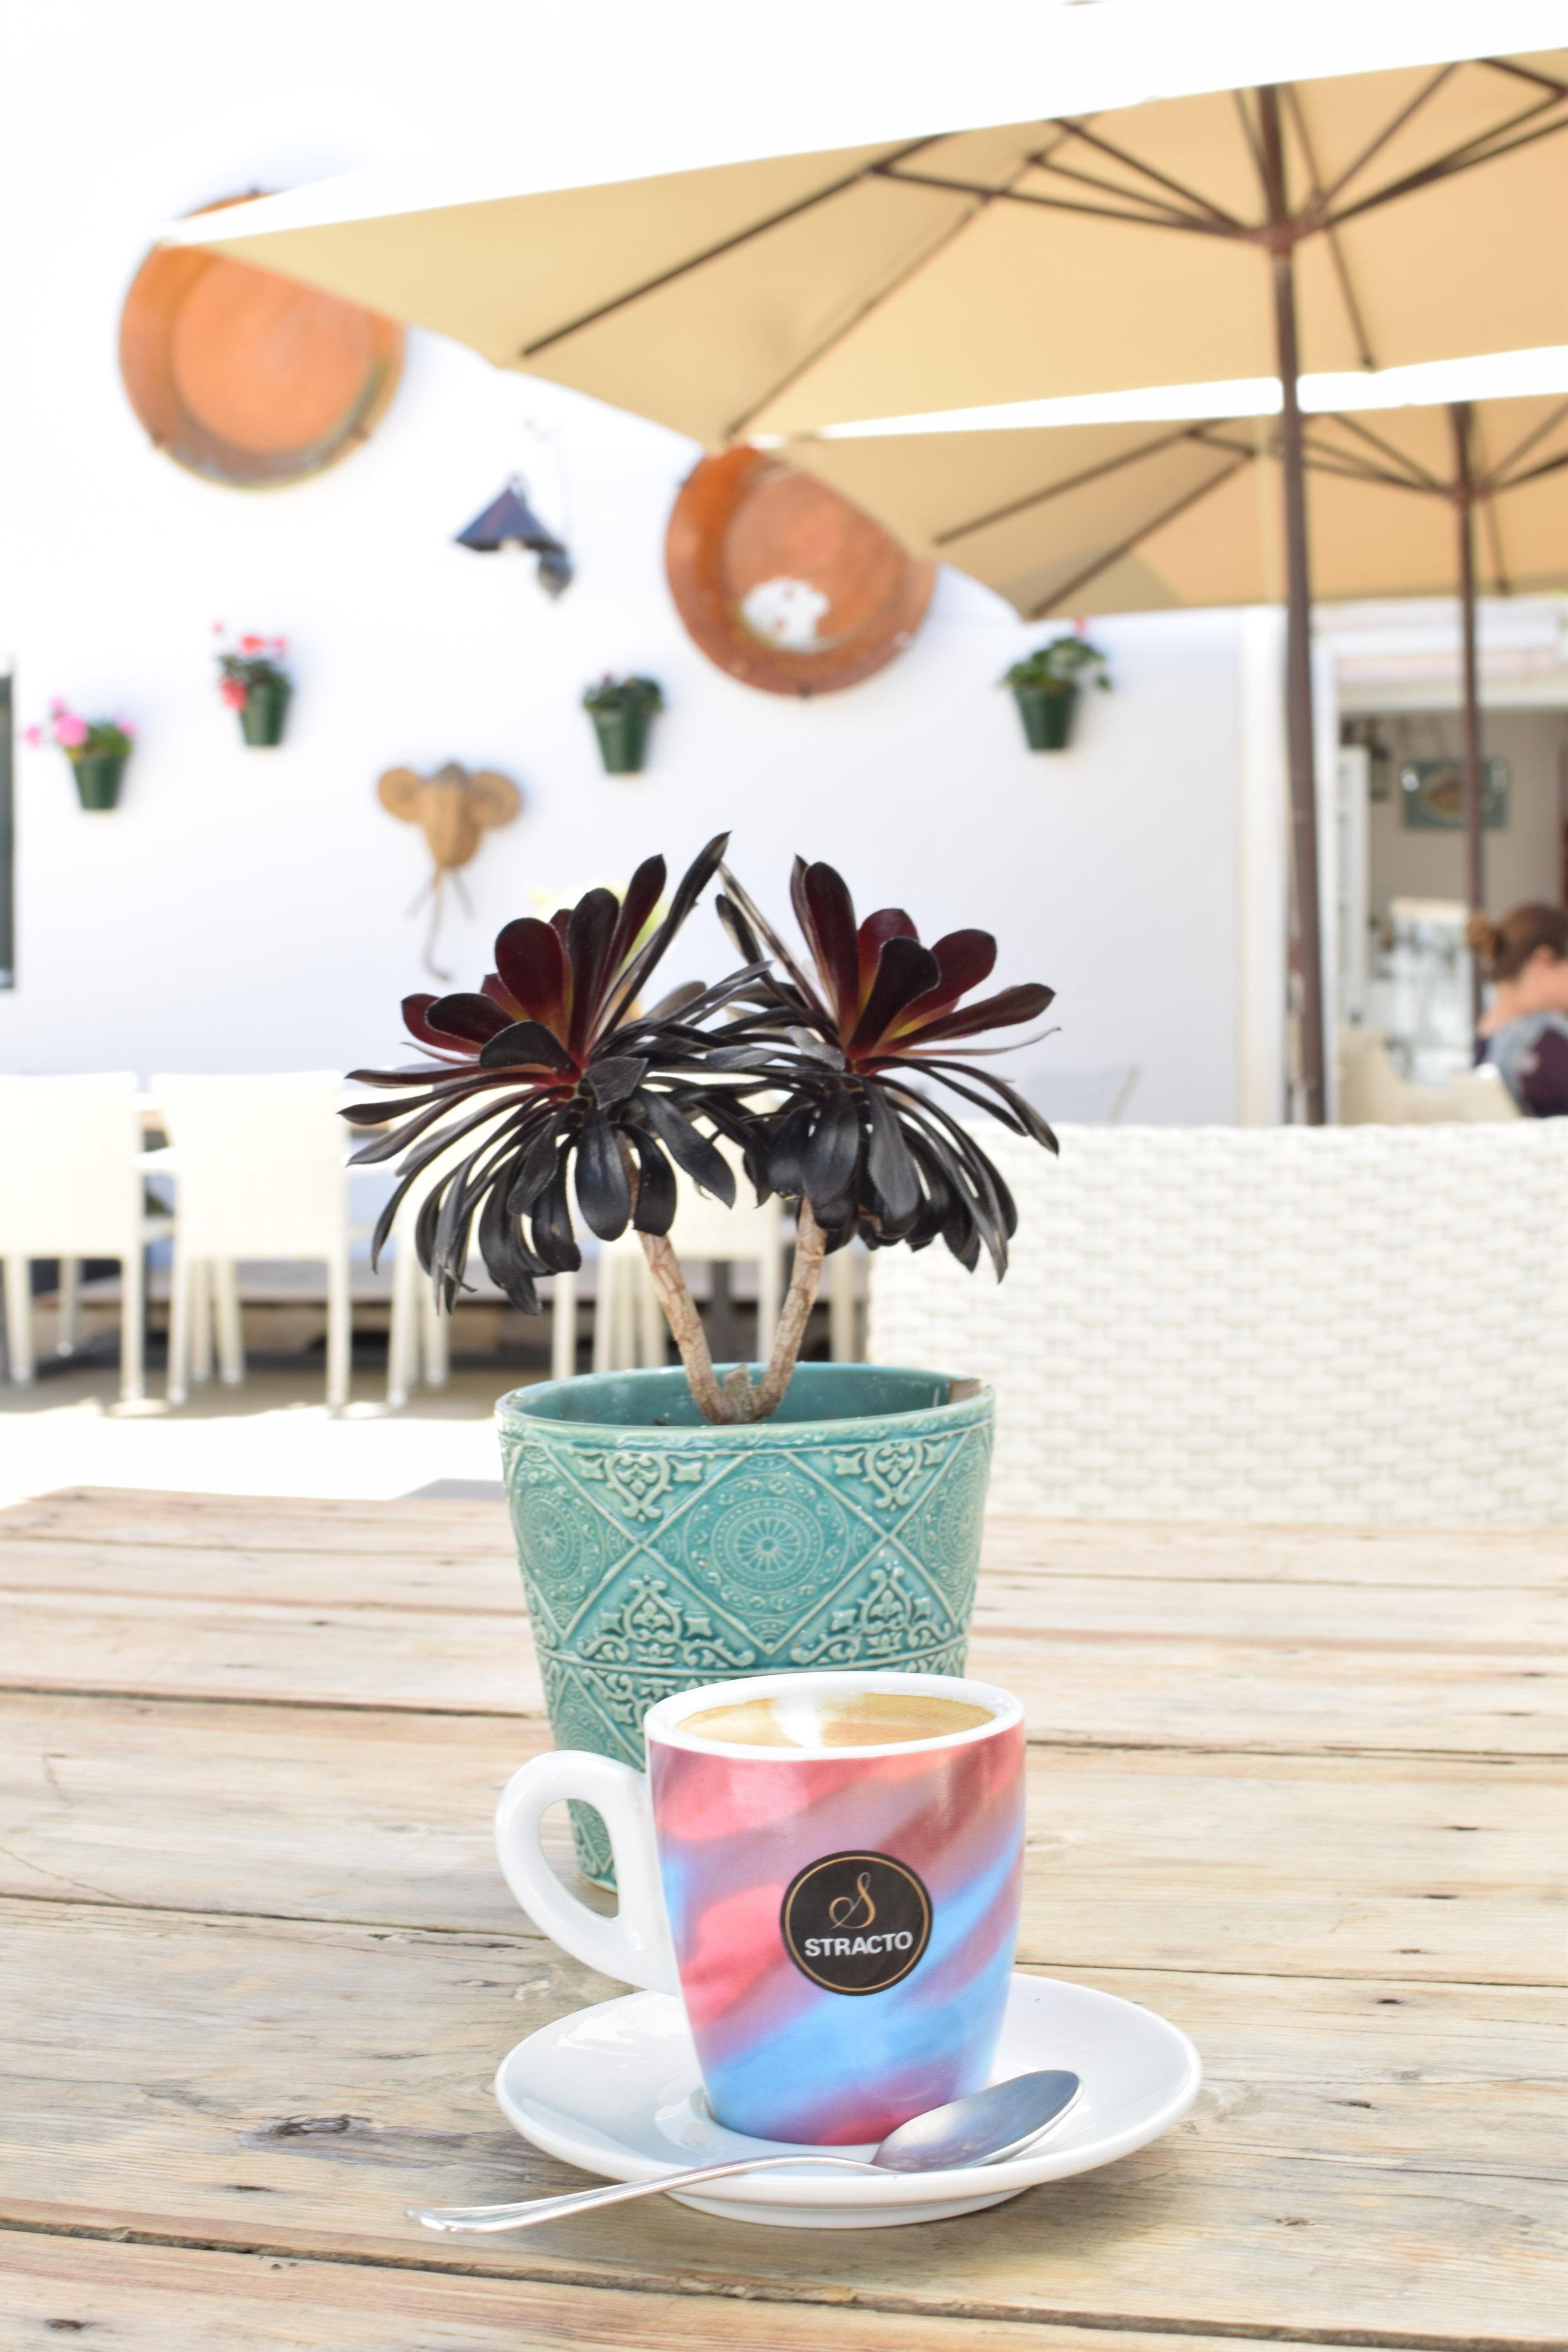 Best-coffee-Vejer-de-la-frontera.jpg